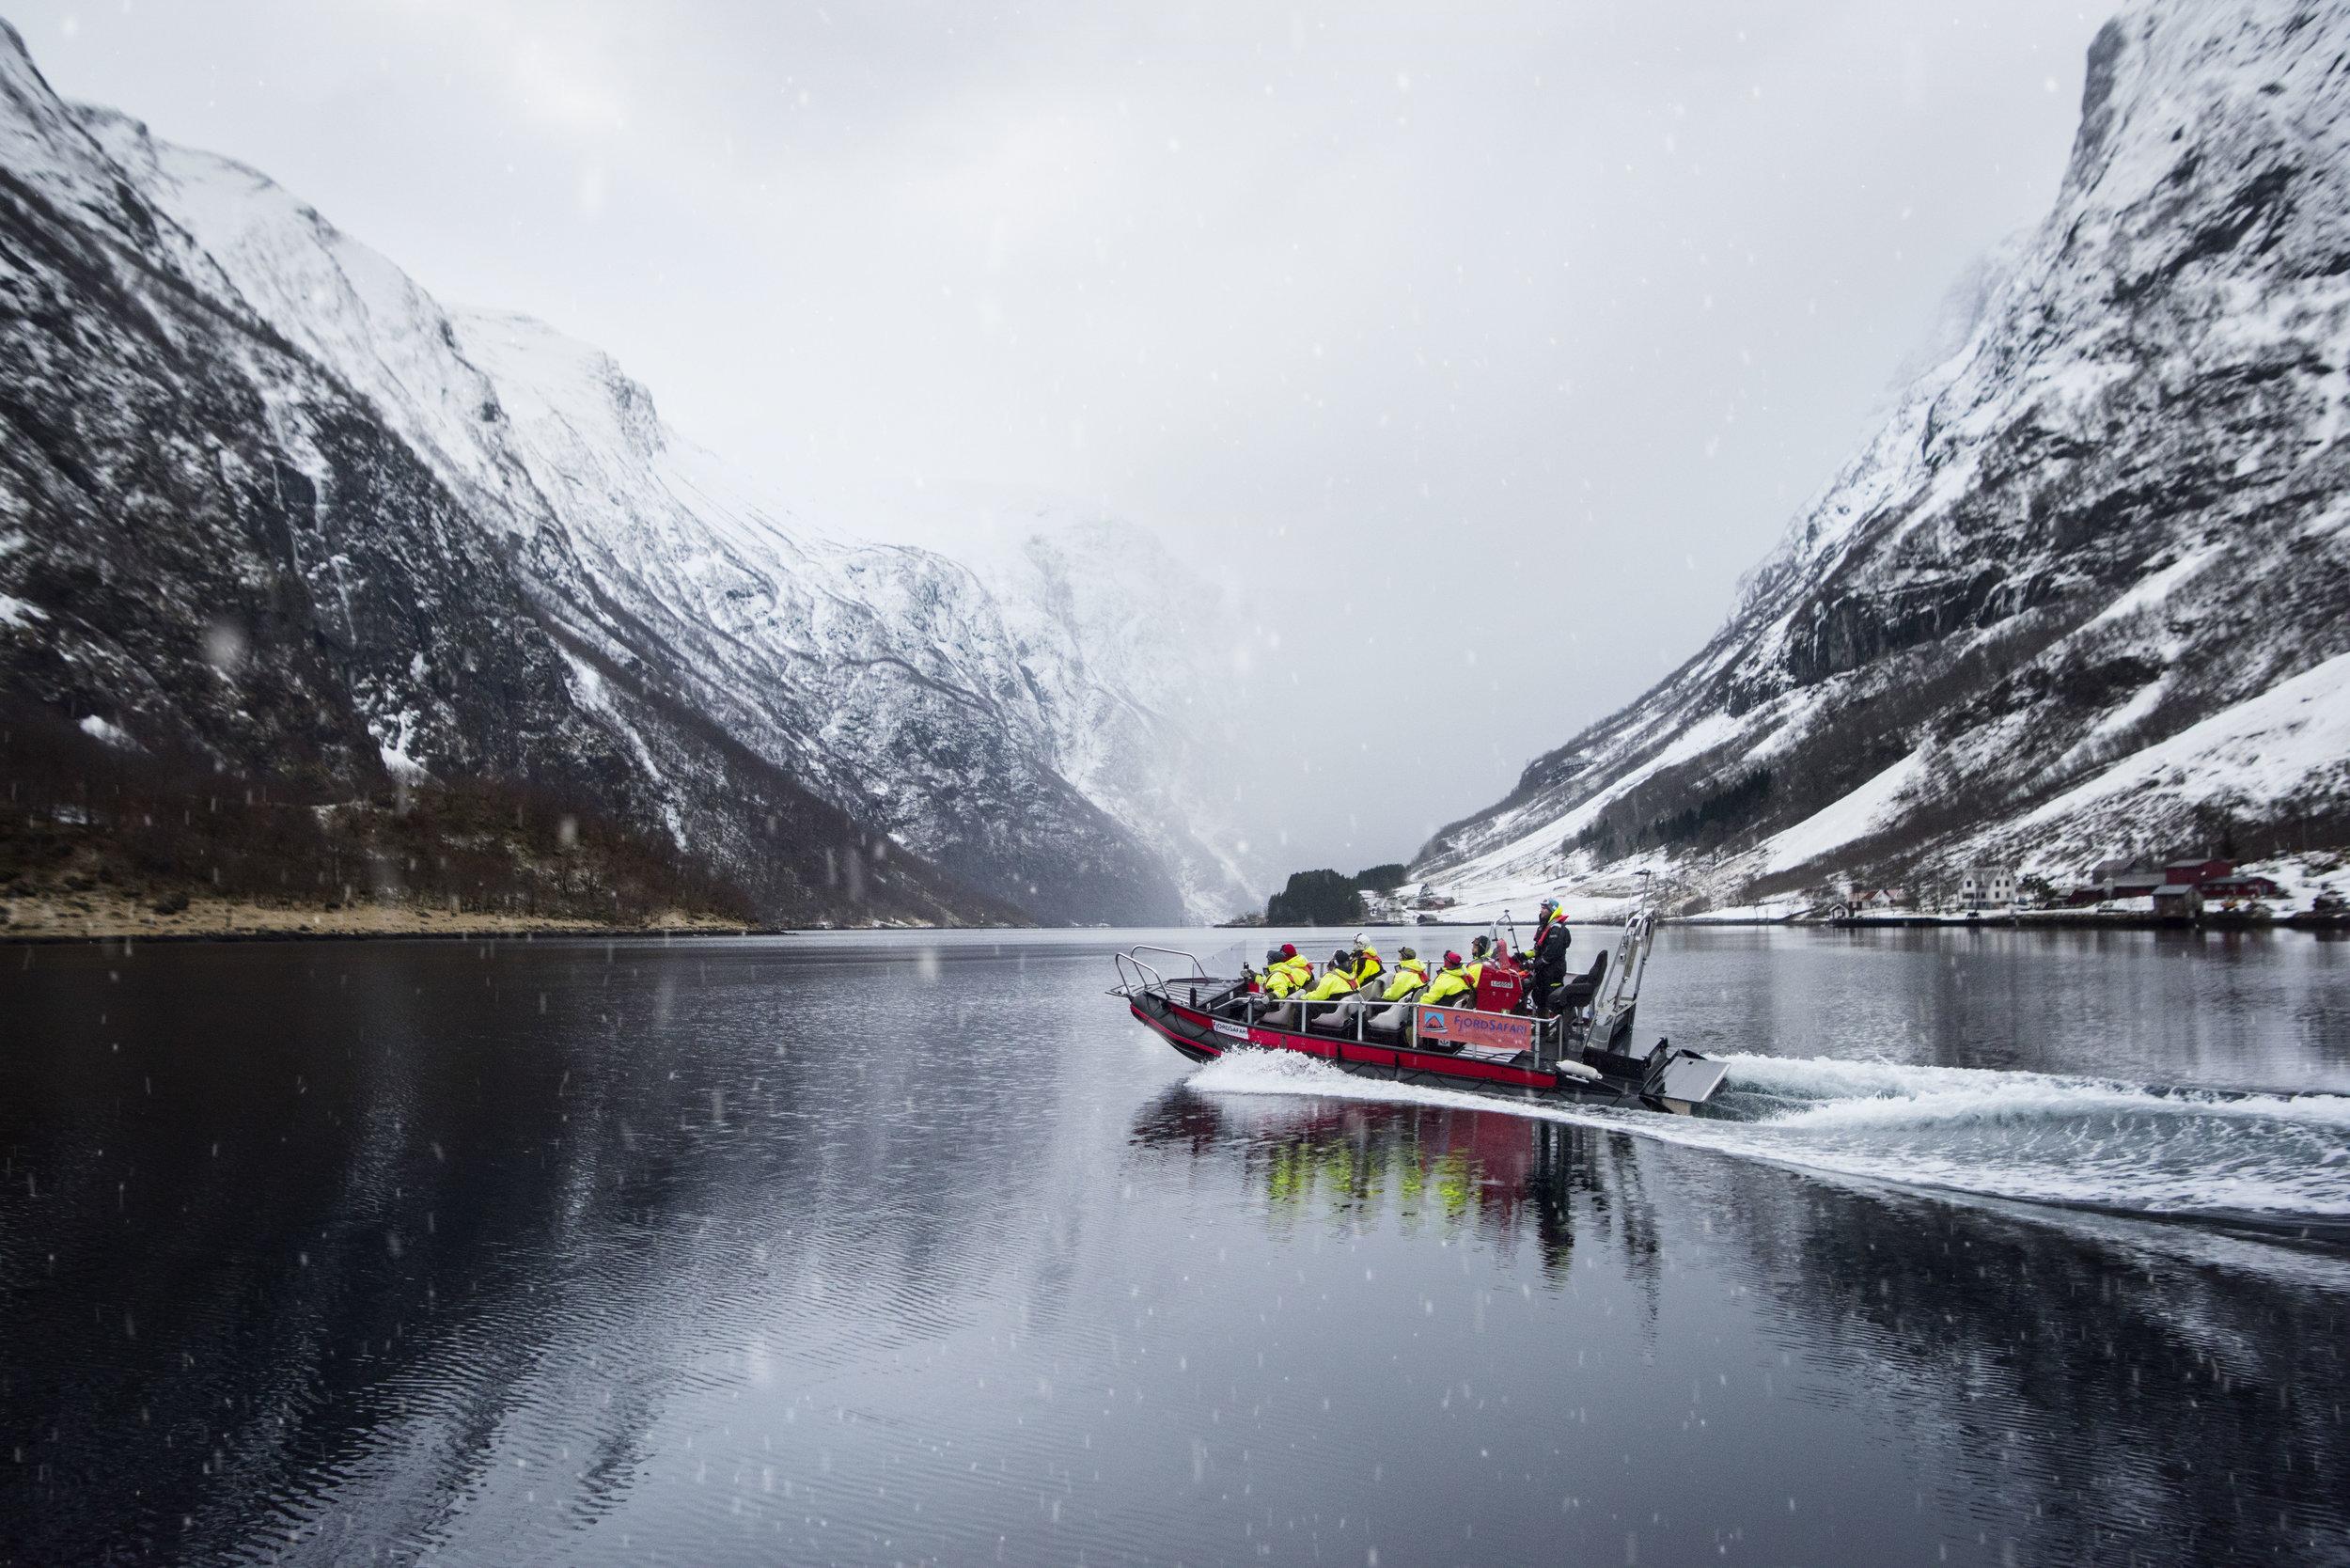 practical information - Period: November 1st. 2019 – March 31st. 2020Time: 11:45 - 14:15 (meet at 11:15)Dinner: between 18:00 - 20:00 in Ægir BrewPubPrice: NOK 1245 pp. incl. FjordSafari and Ægir Viking Plank